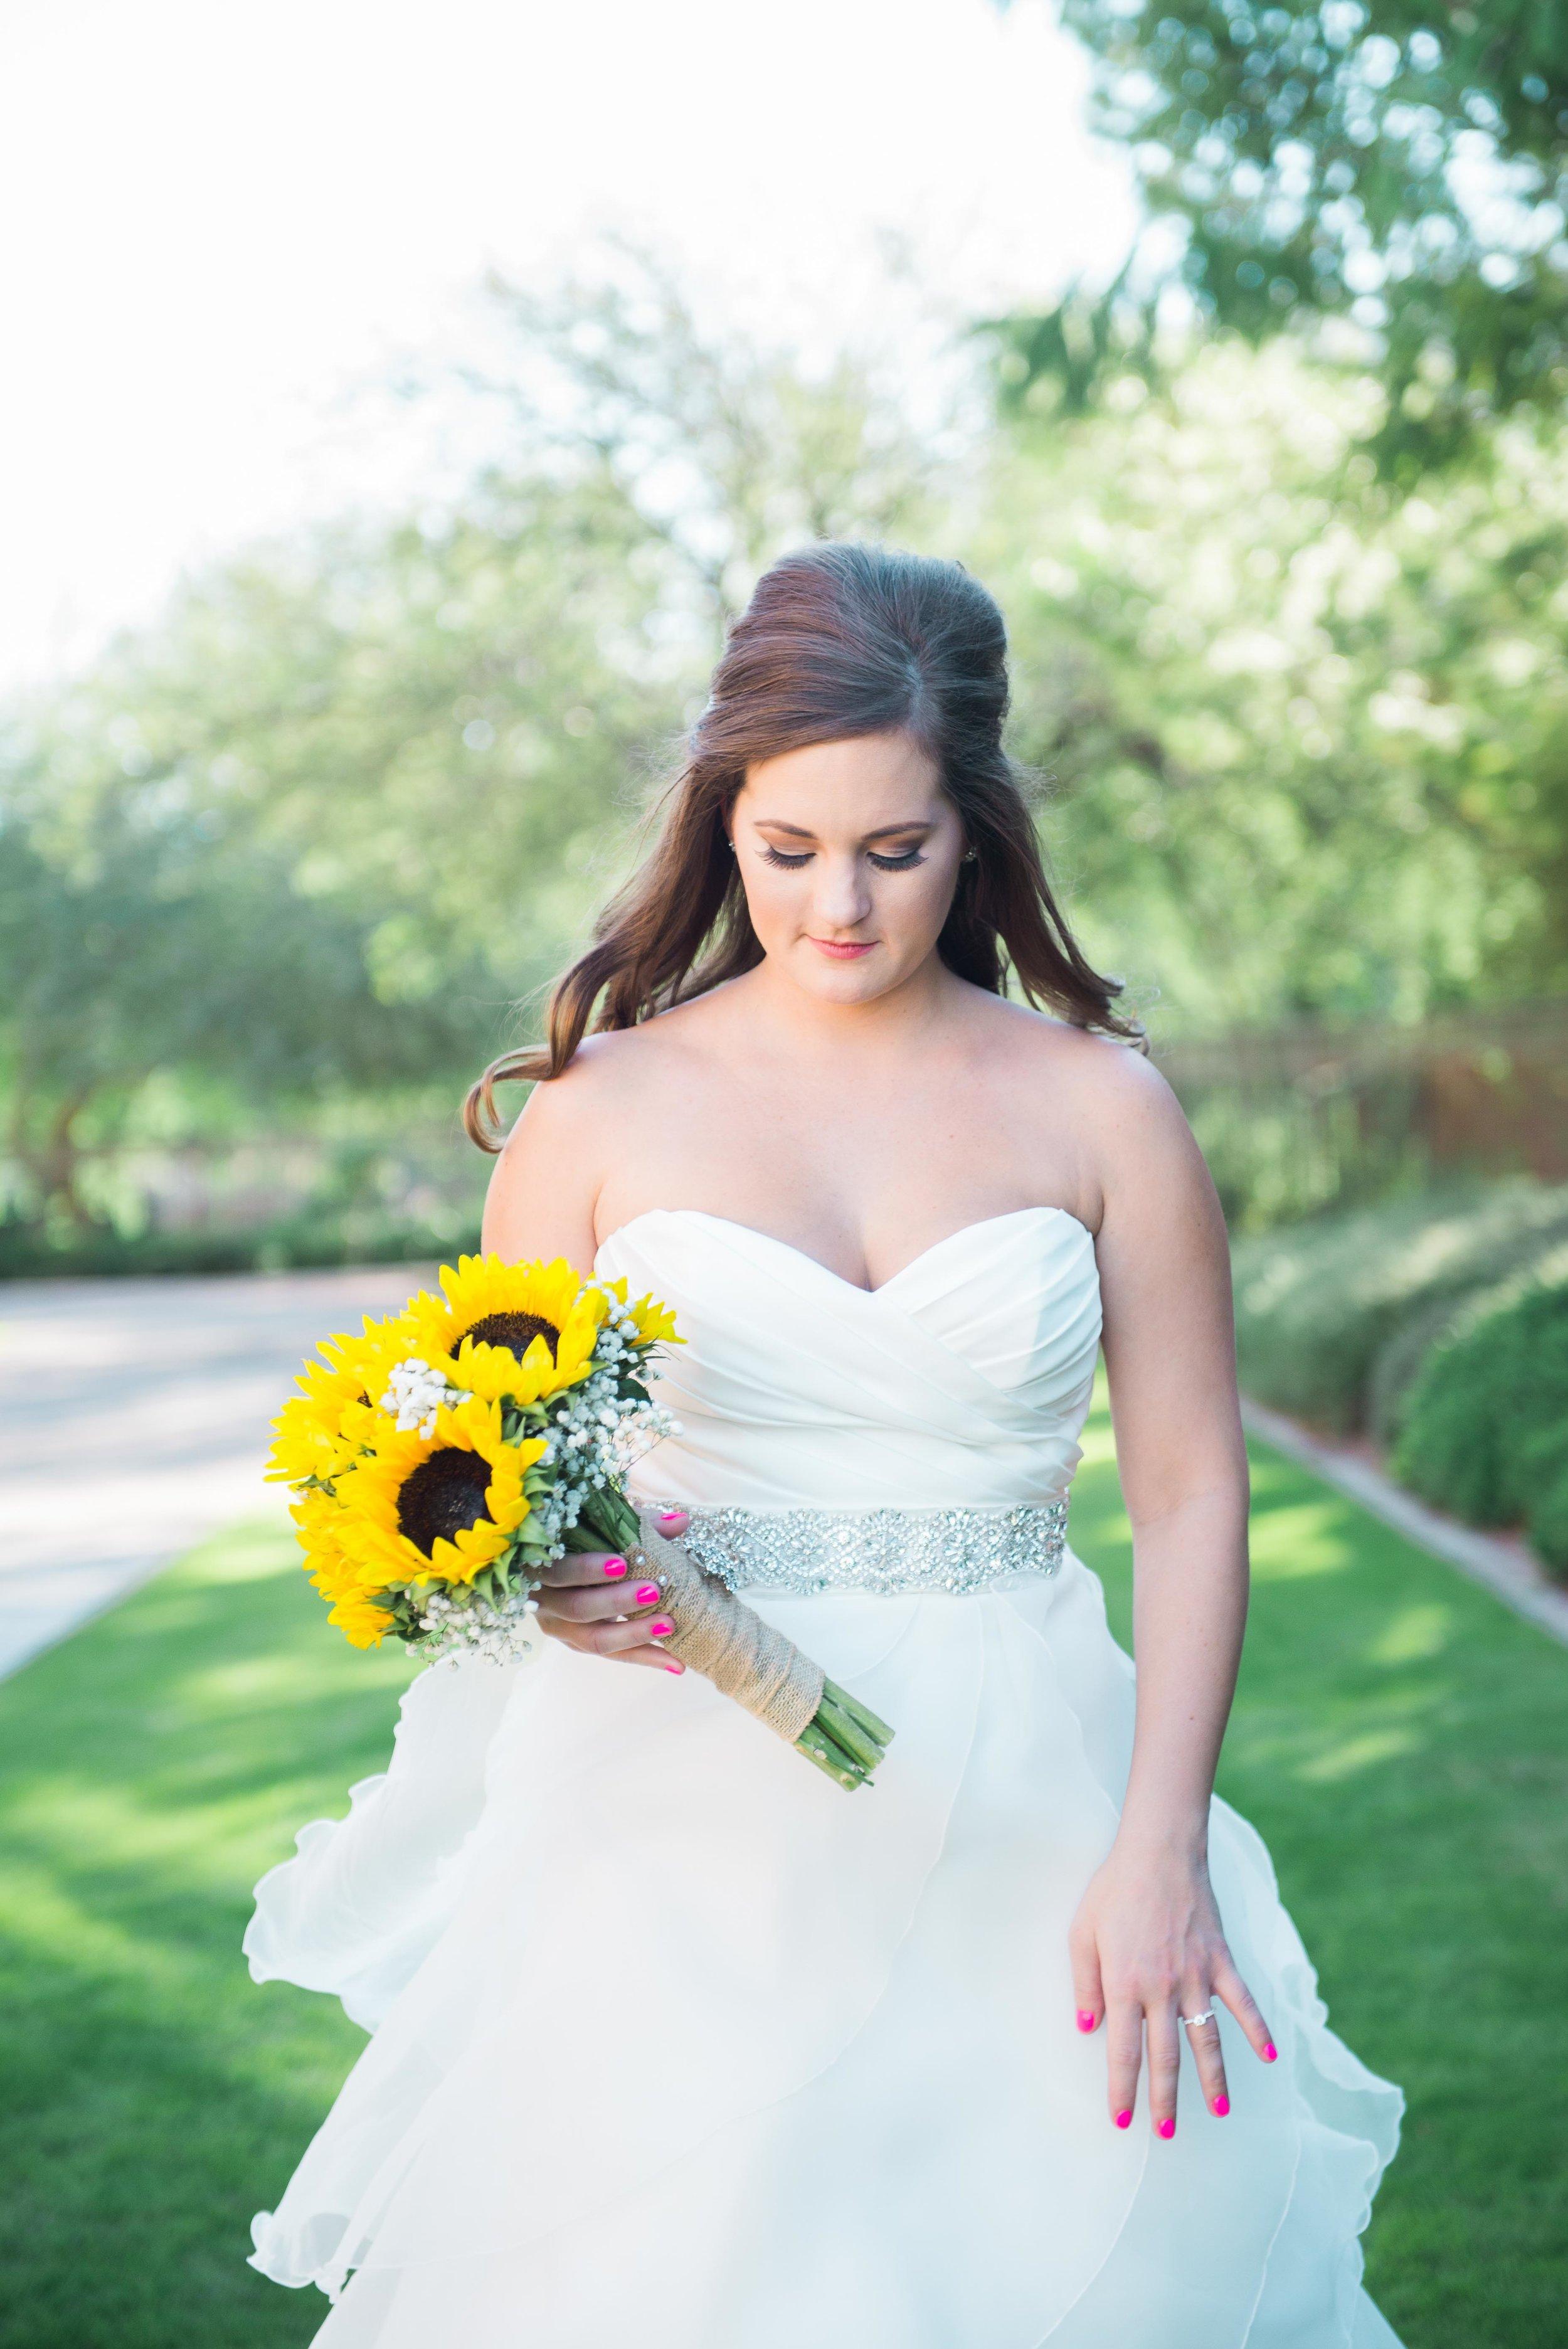 weddingwebsitesmallerpics-137.jpg